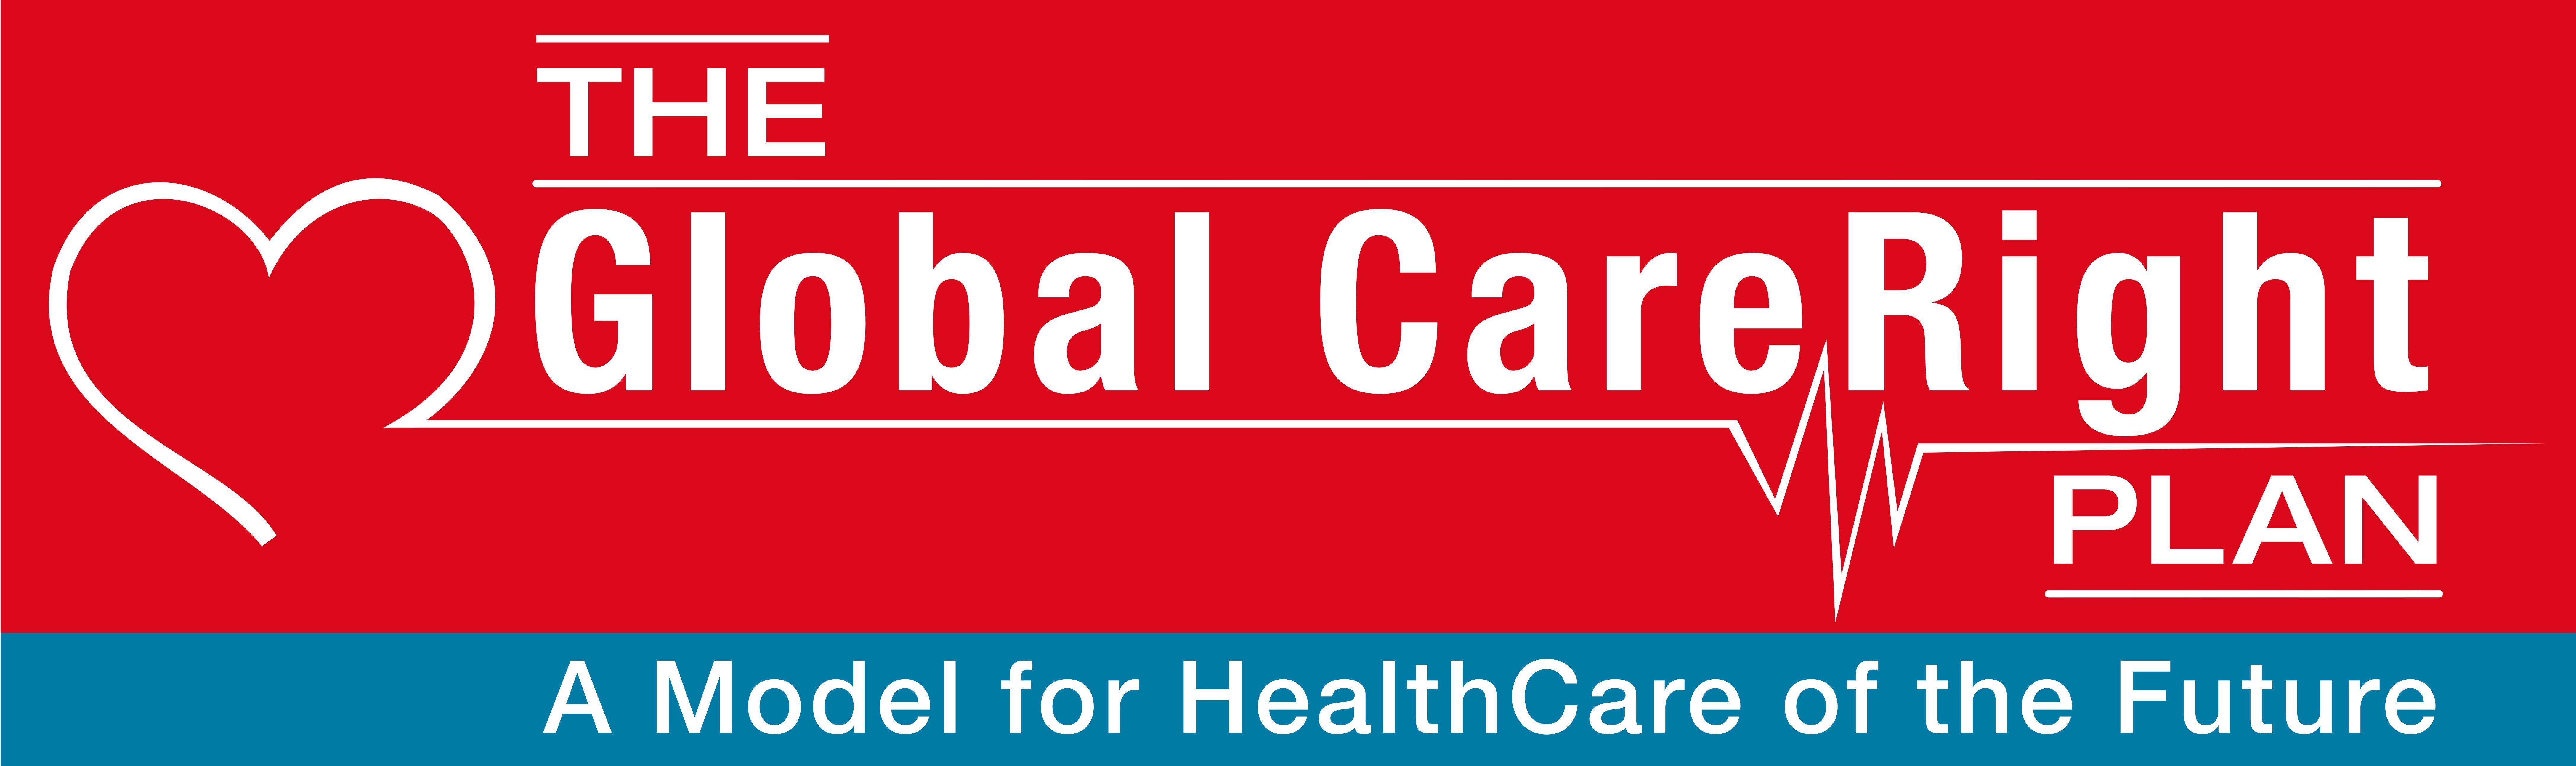 CareRight HealthCare International logo